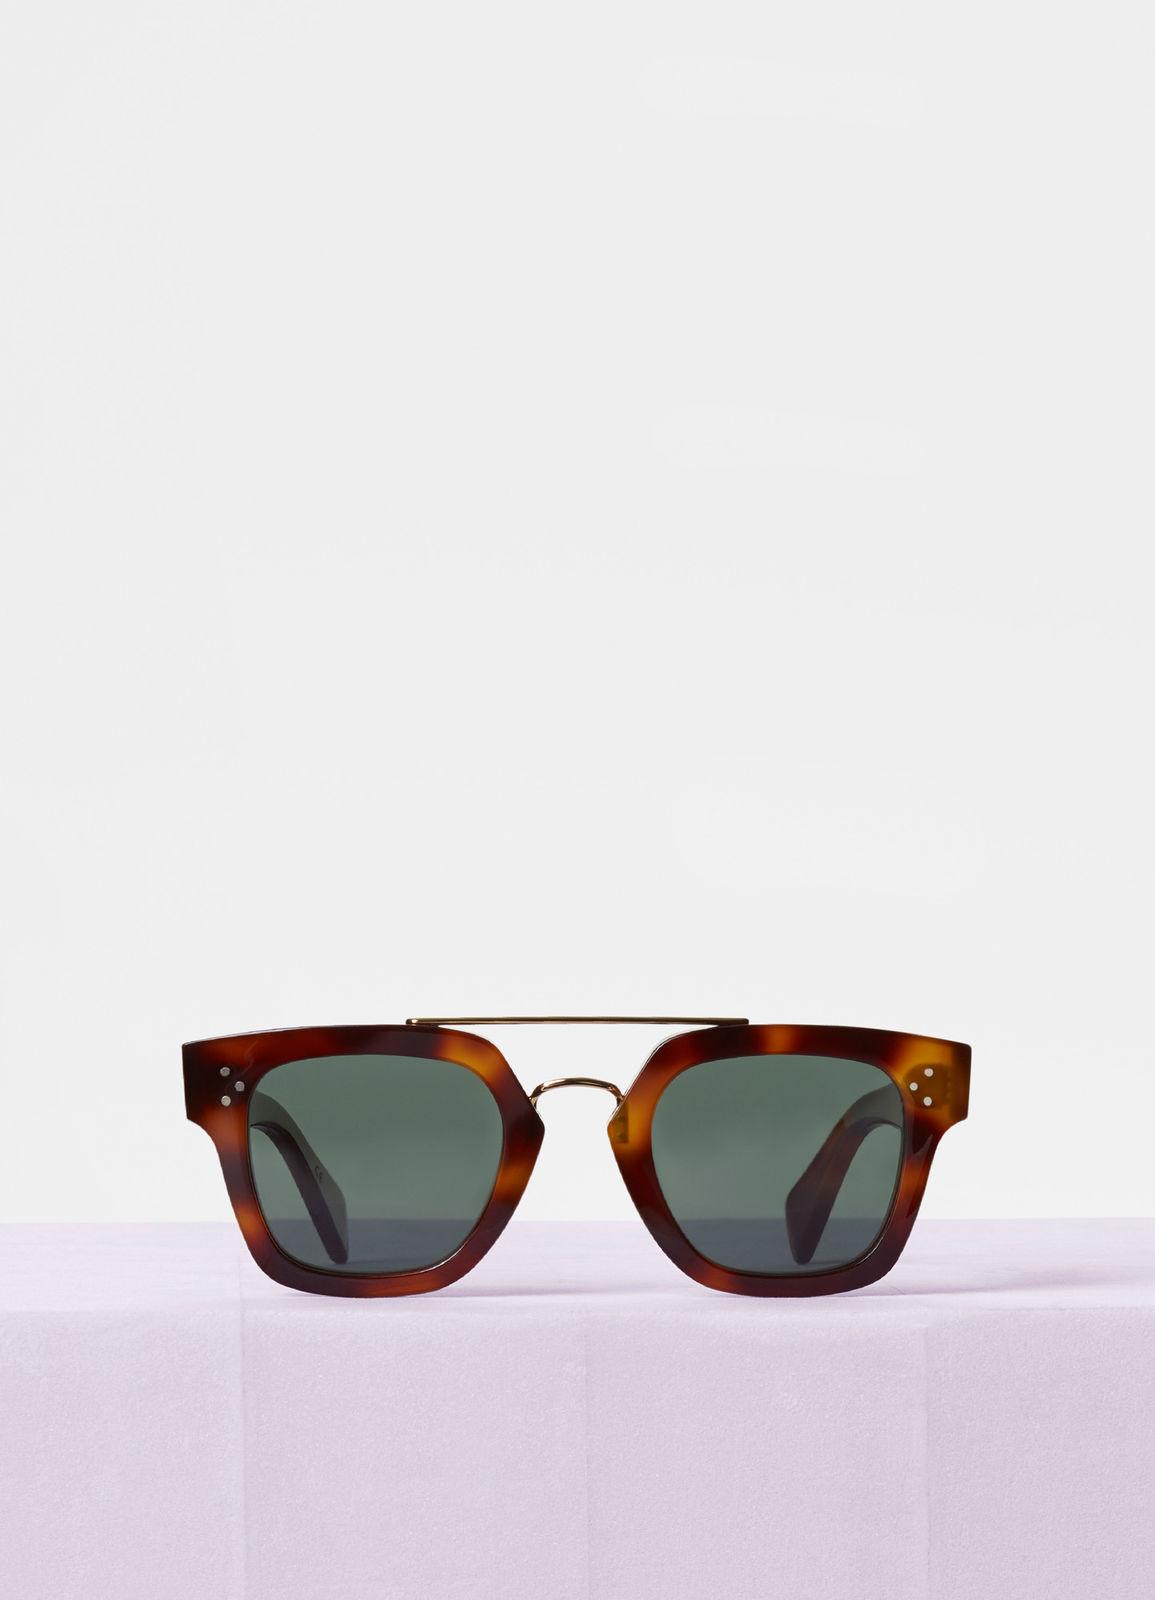 CELINE- CL40024U Sunglasses  £340  COLOUR Tortoise/Gold  CATEGORY SUN  MATERIAL Combination  SHAPE Wayfarer